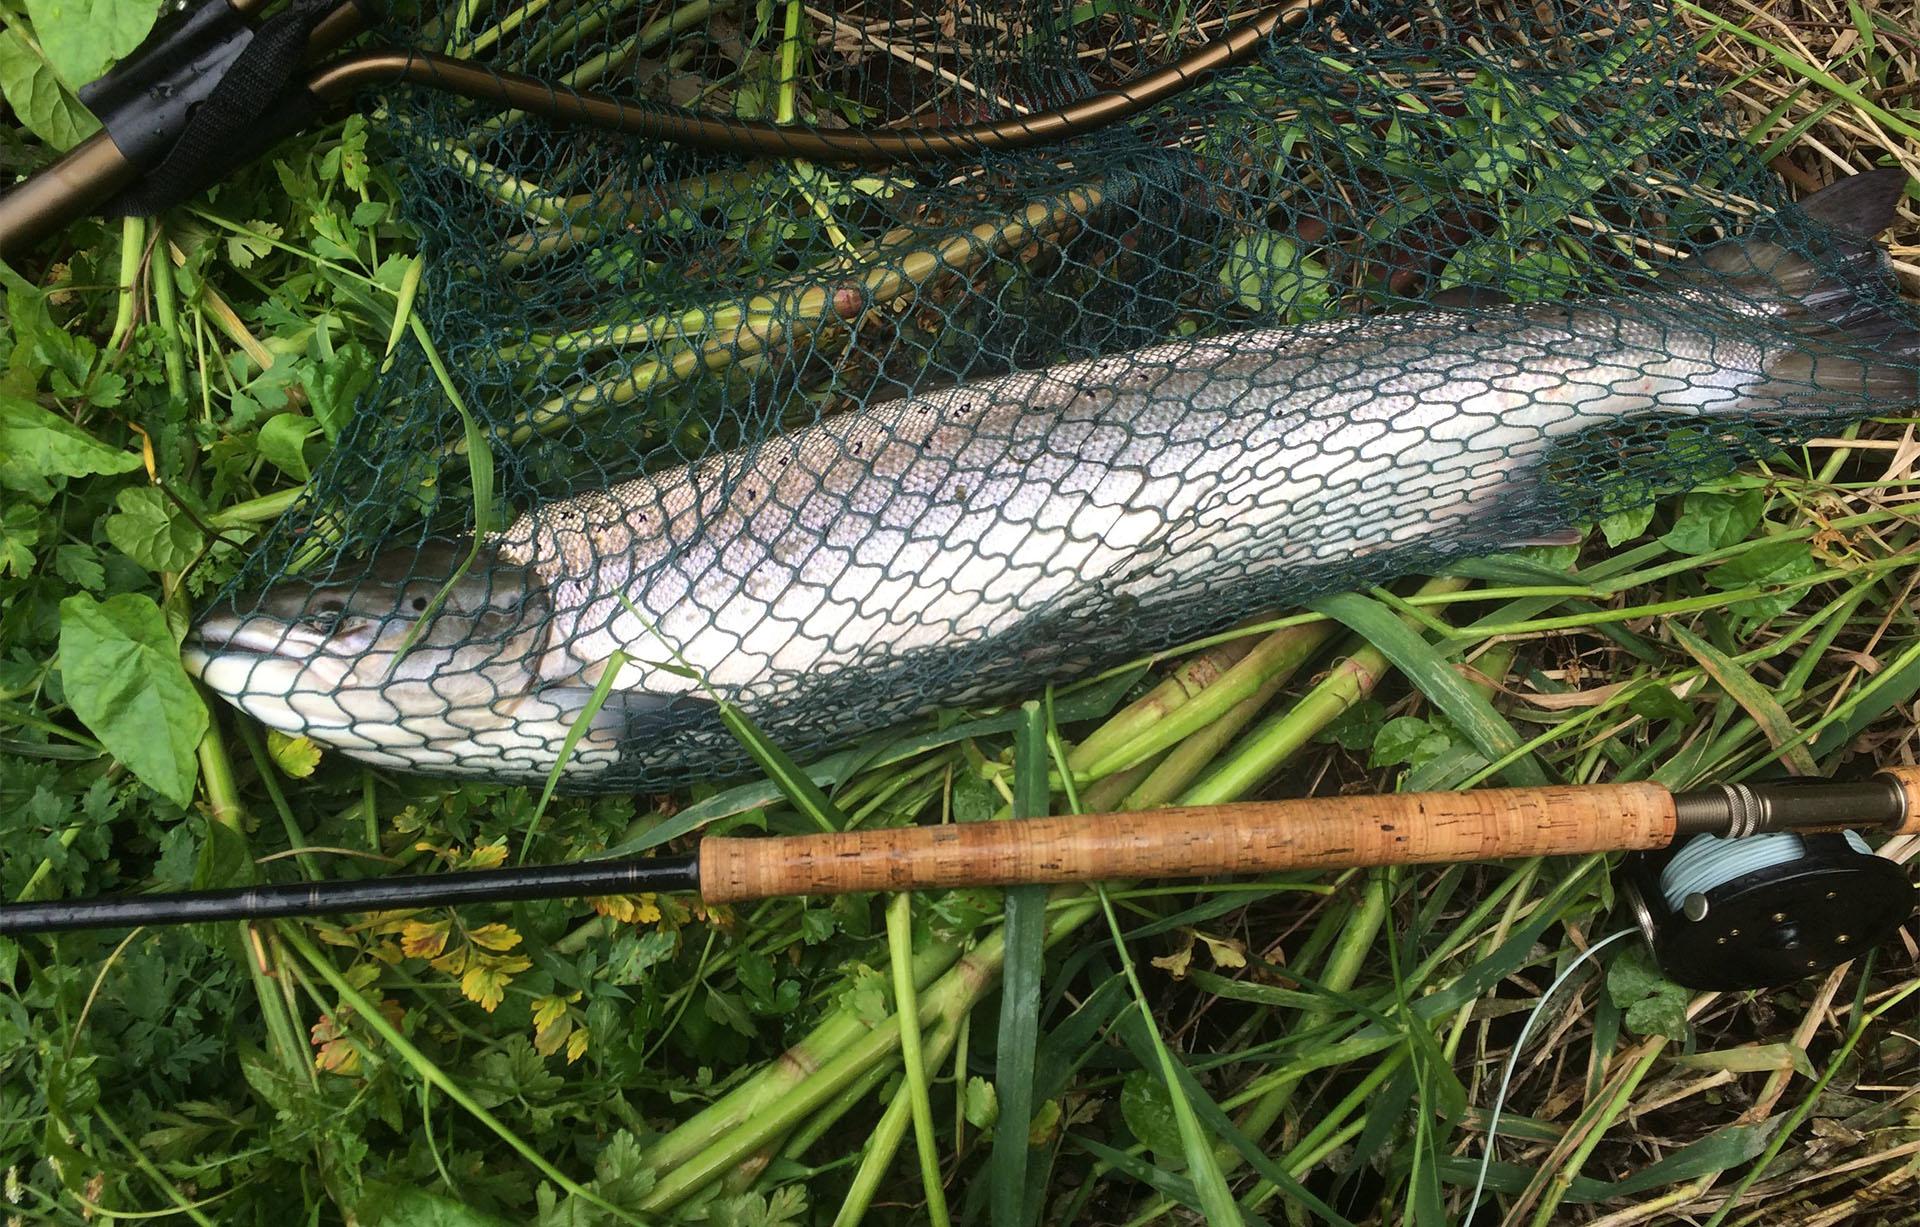 4th_fish.jpg